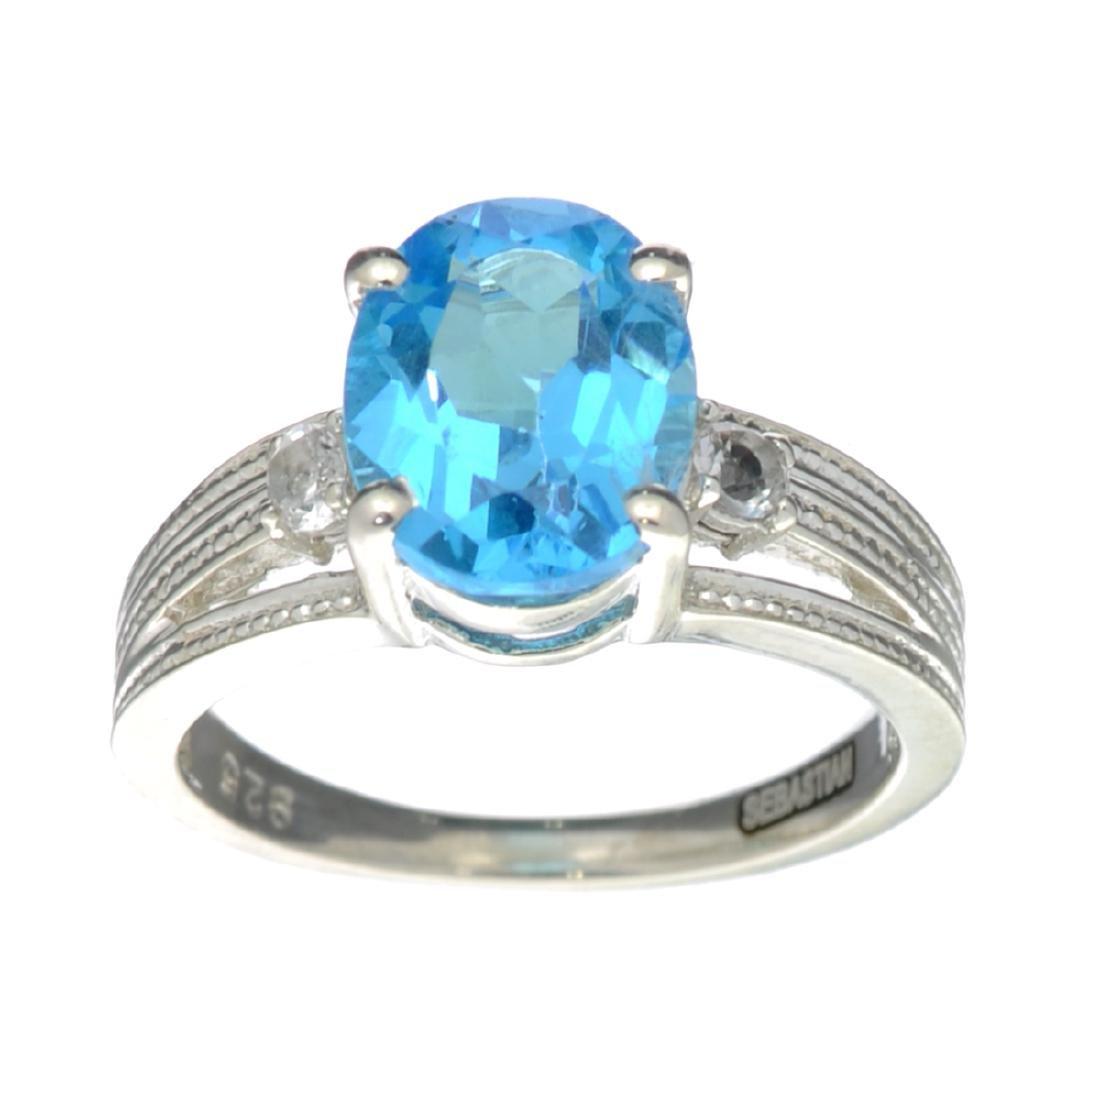 APP: 0.5k Fine Jewelry Designer Sebastian, 3.11CT